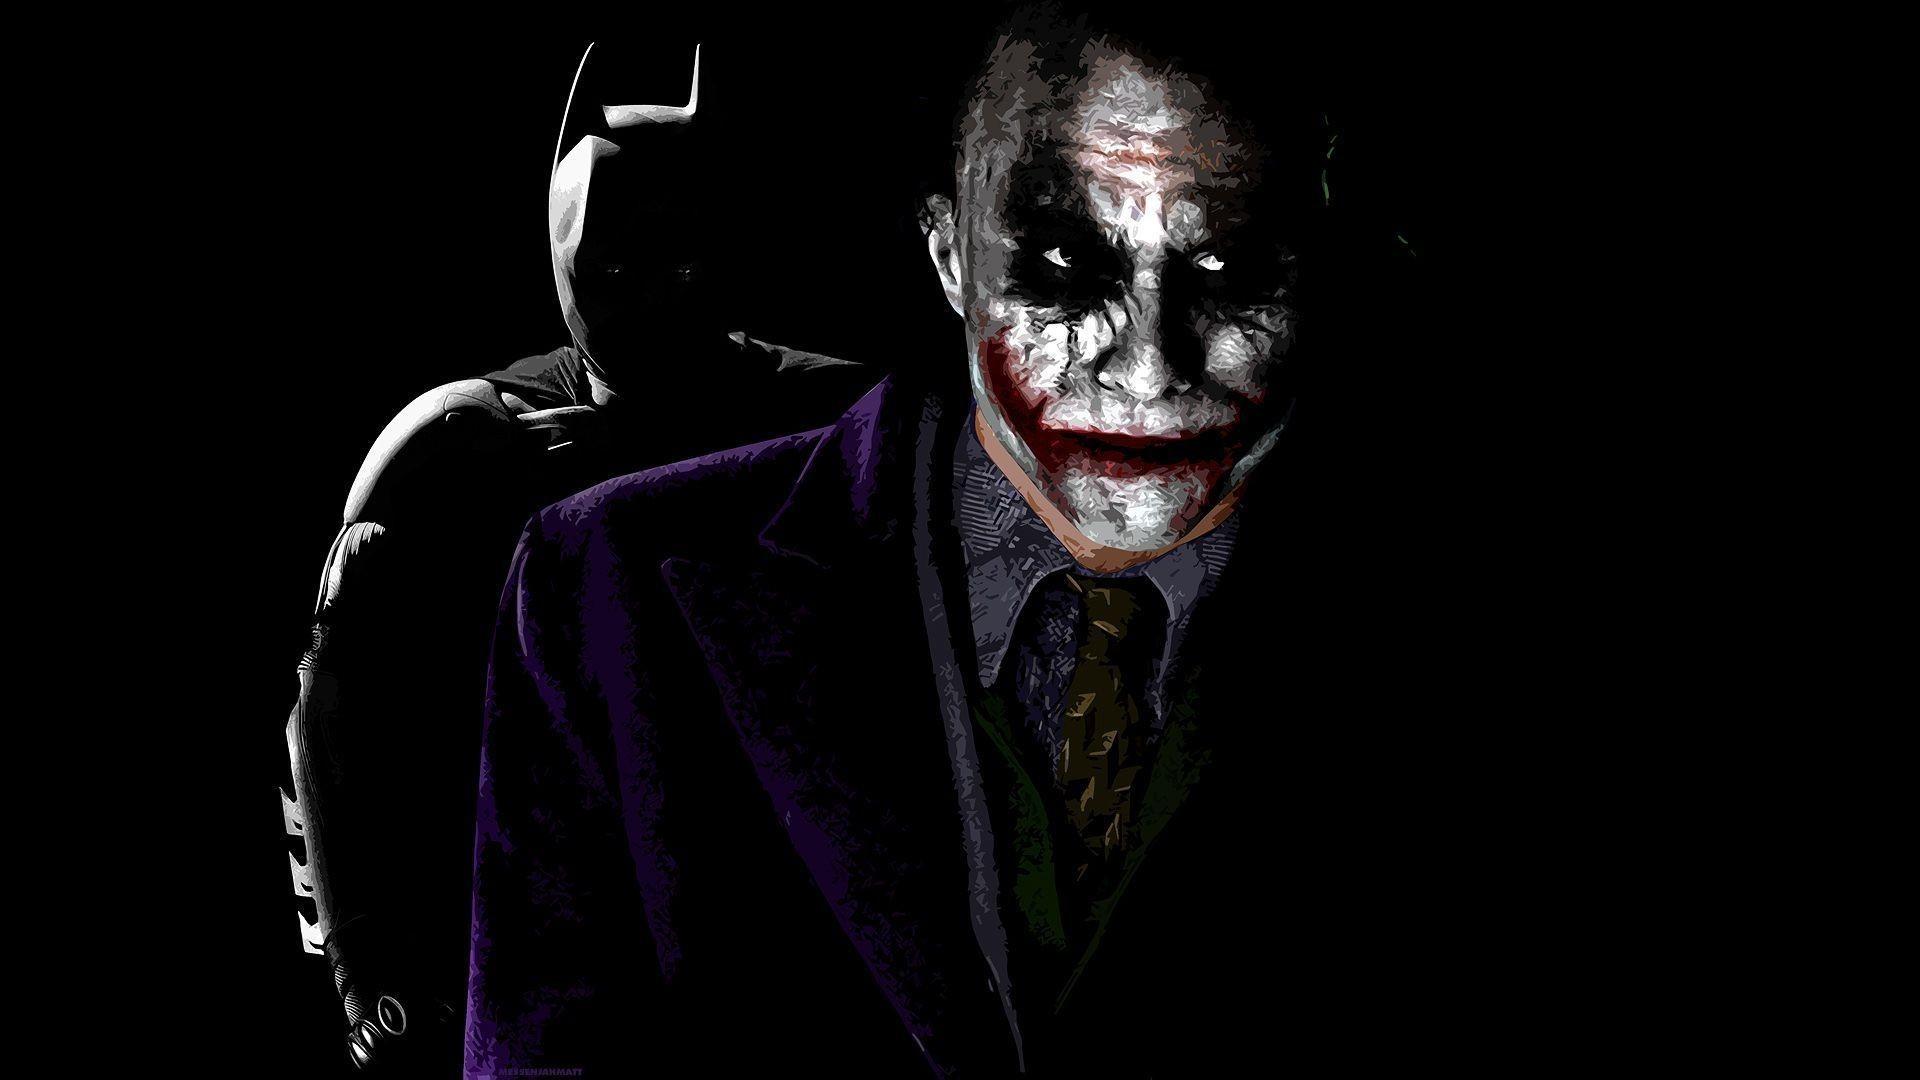 batman vs joker wallpapers a'